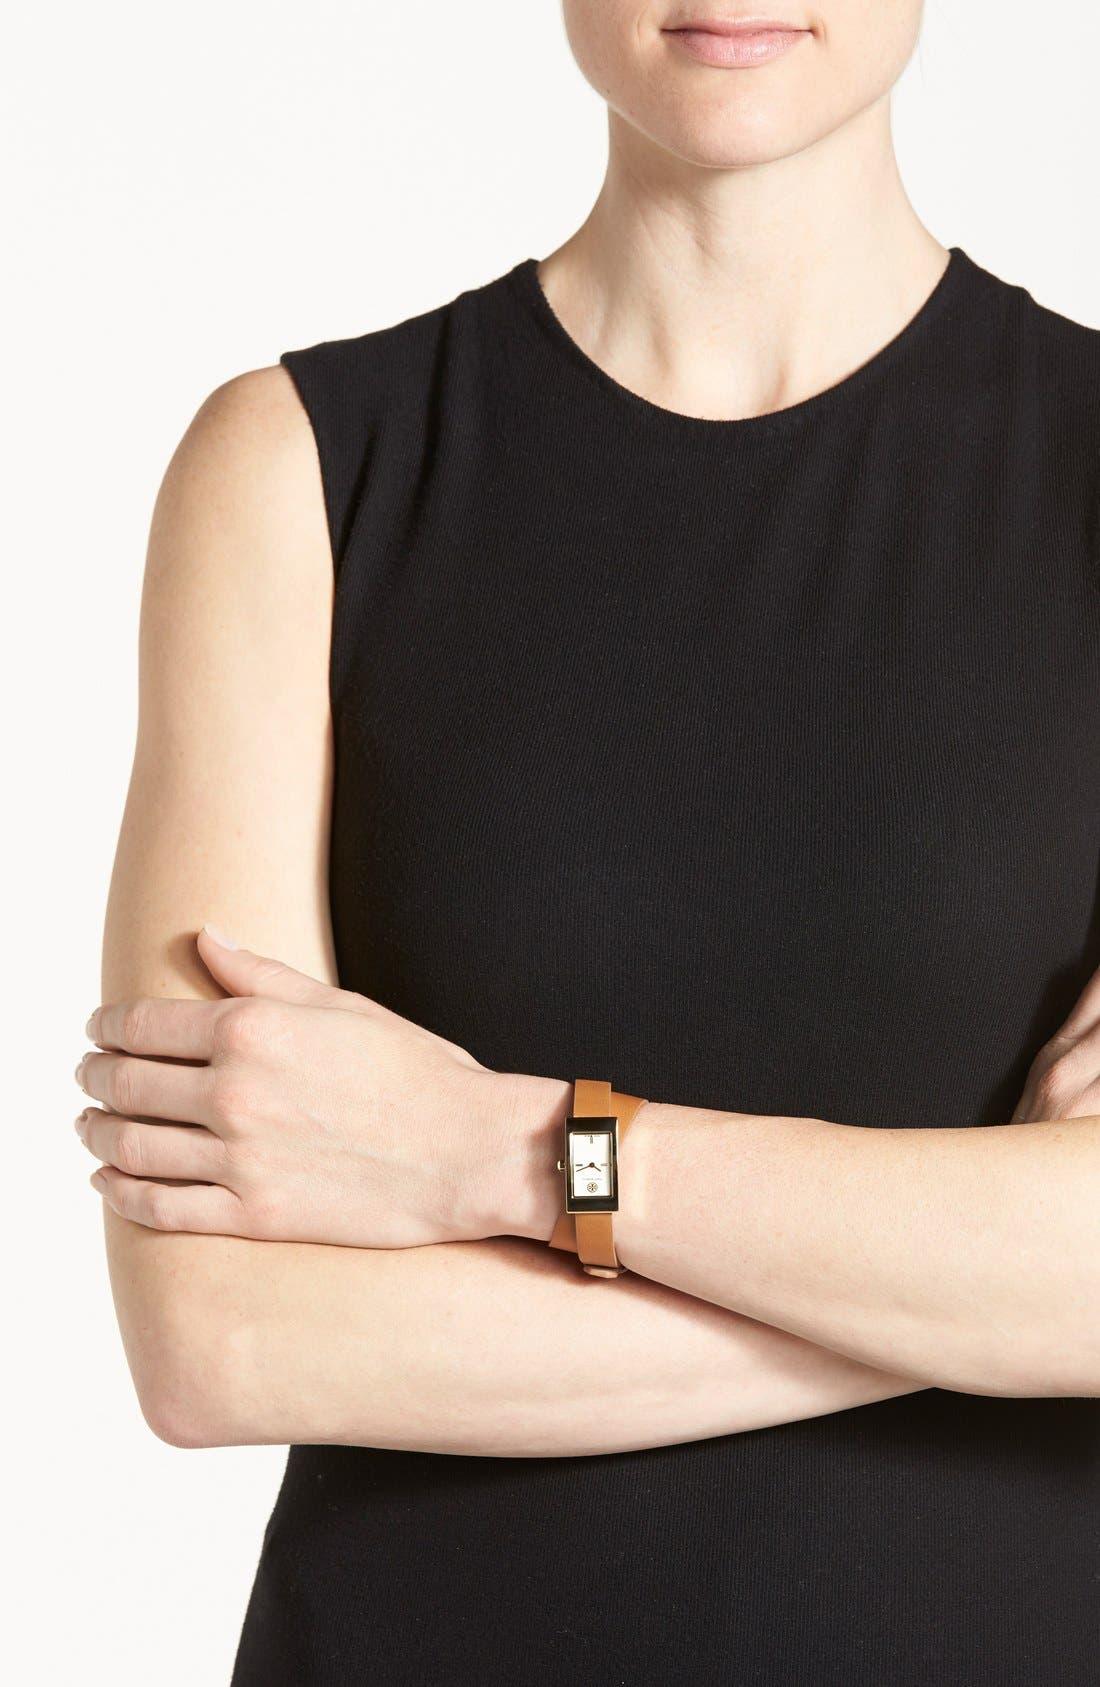 Alternate Image 4  - Tory Burch 'Buddy Signature' Rectangular Wrap Leather Strap Watch, 17mm x 31mm